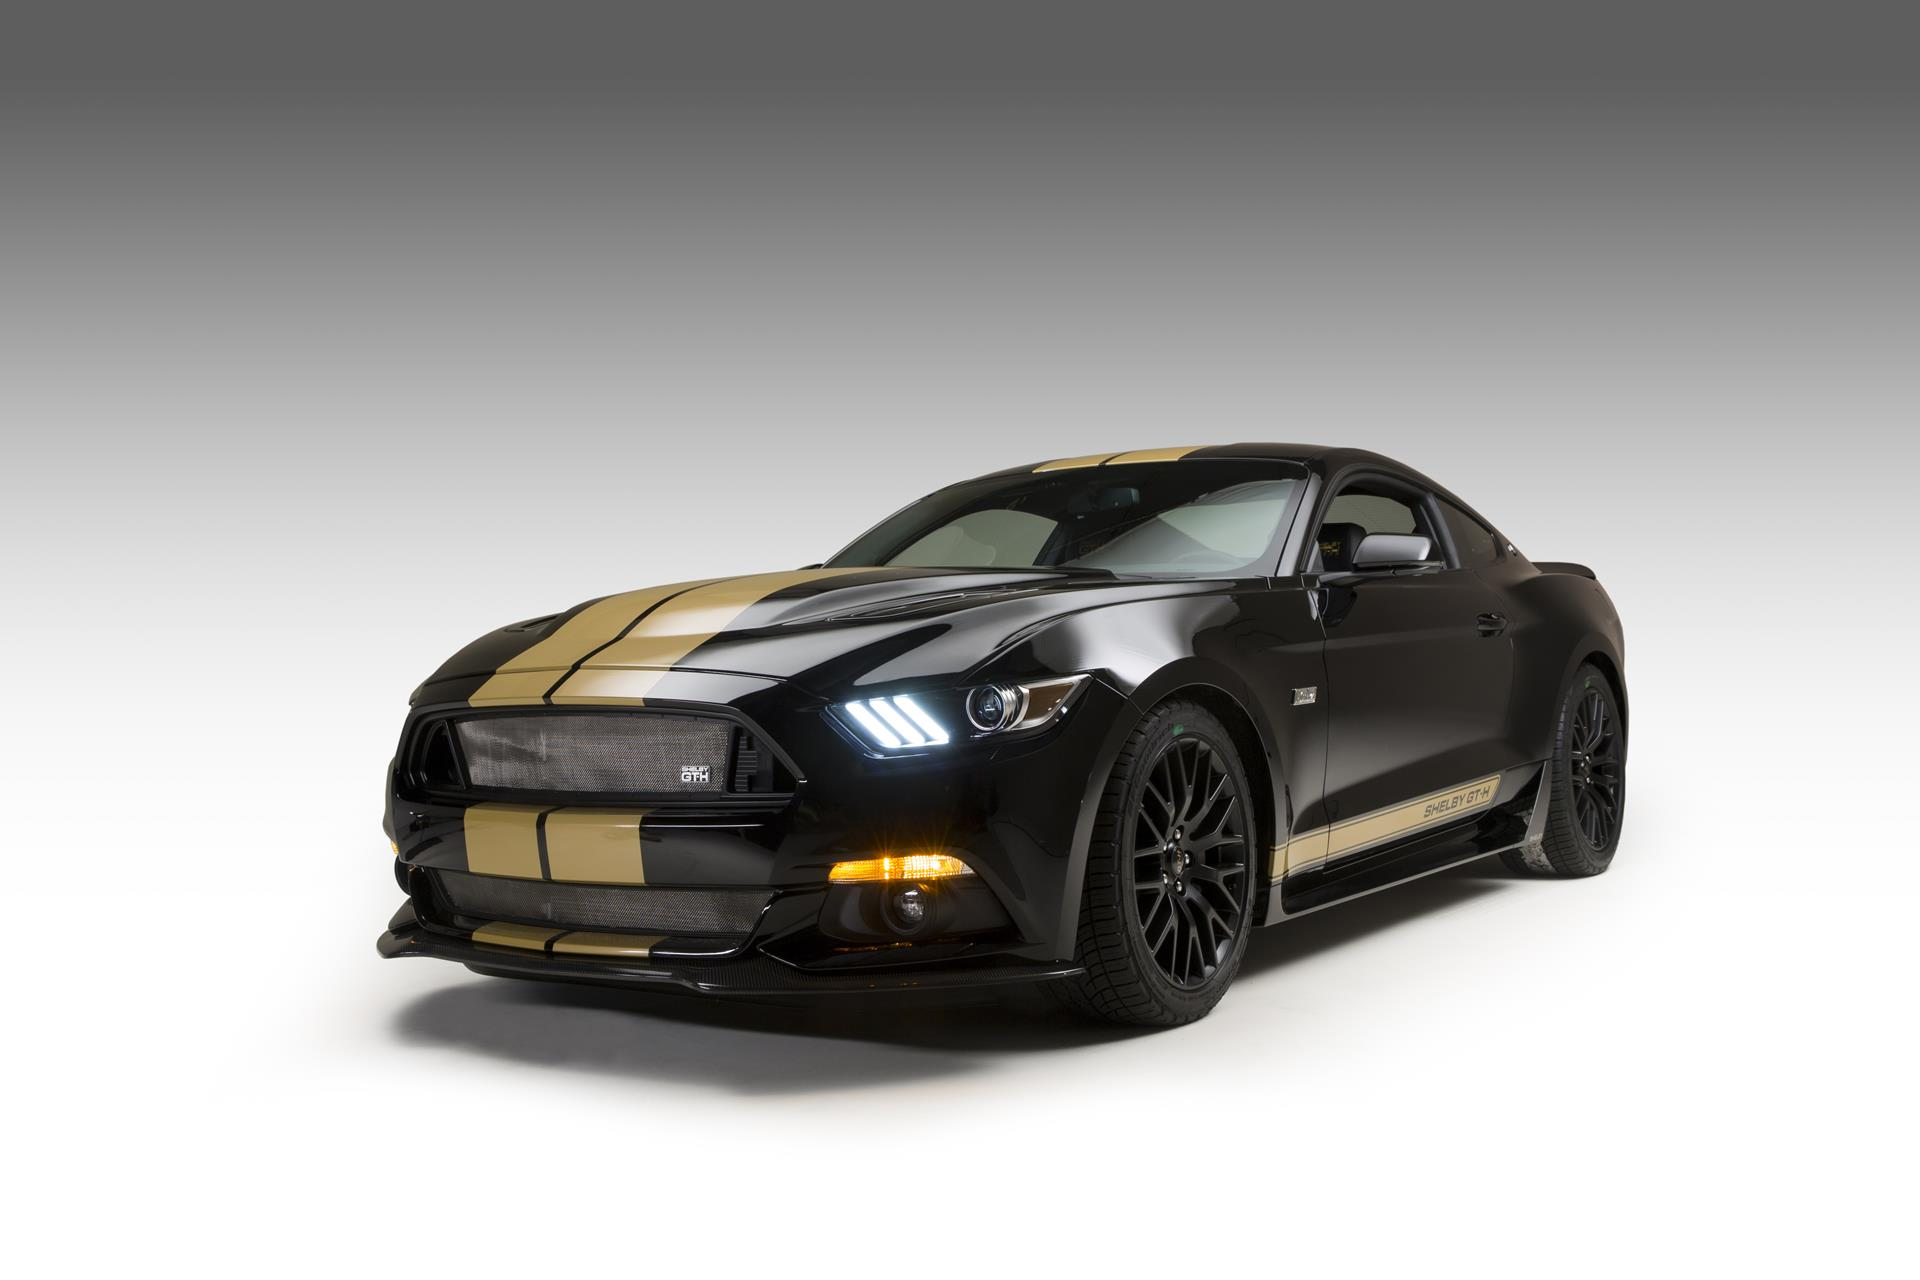 Hertz Auto Sales >> 2016 Shelby Mustang GT-H - conceptcarz.com